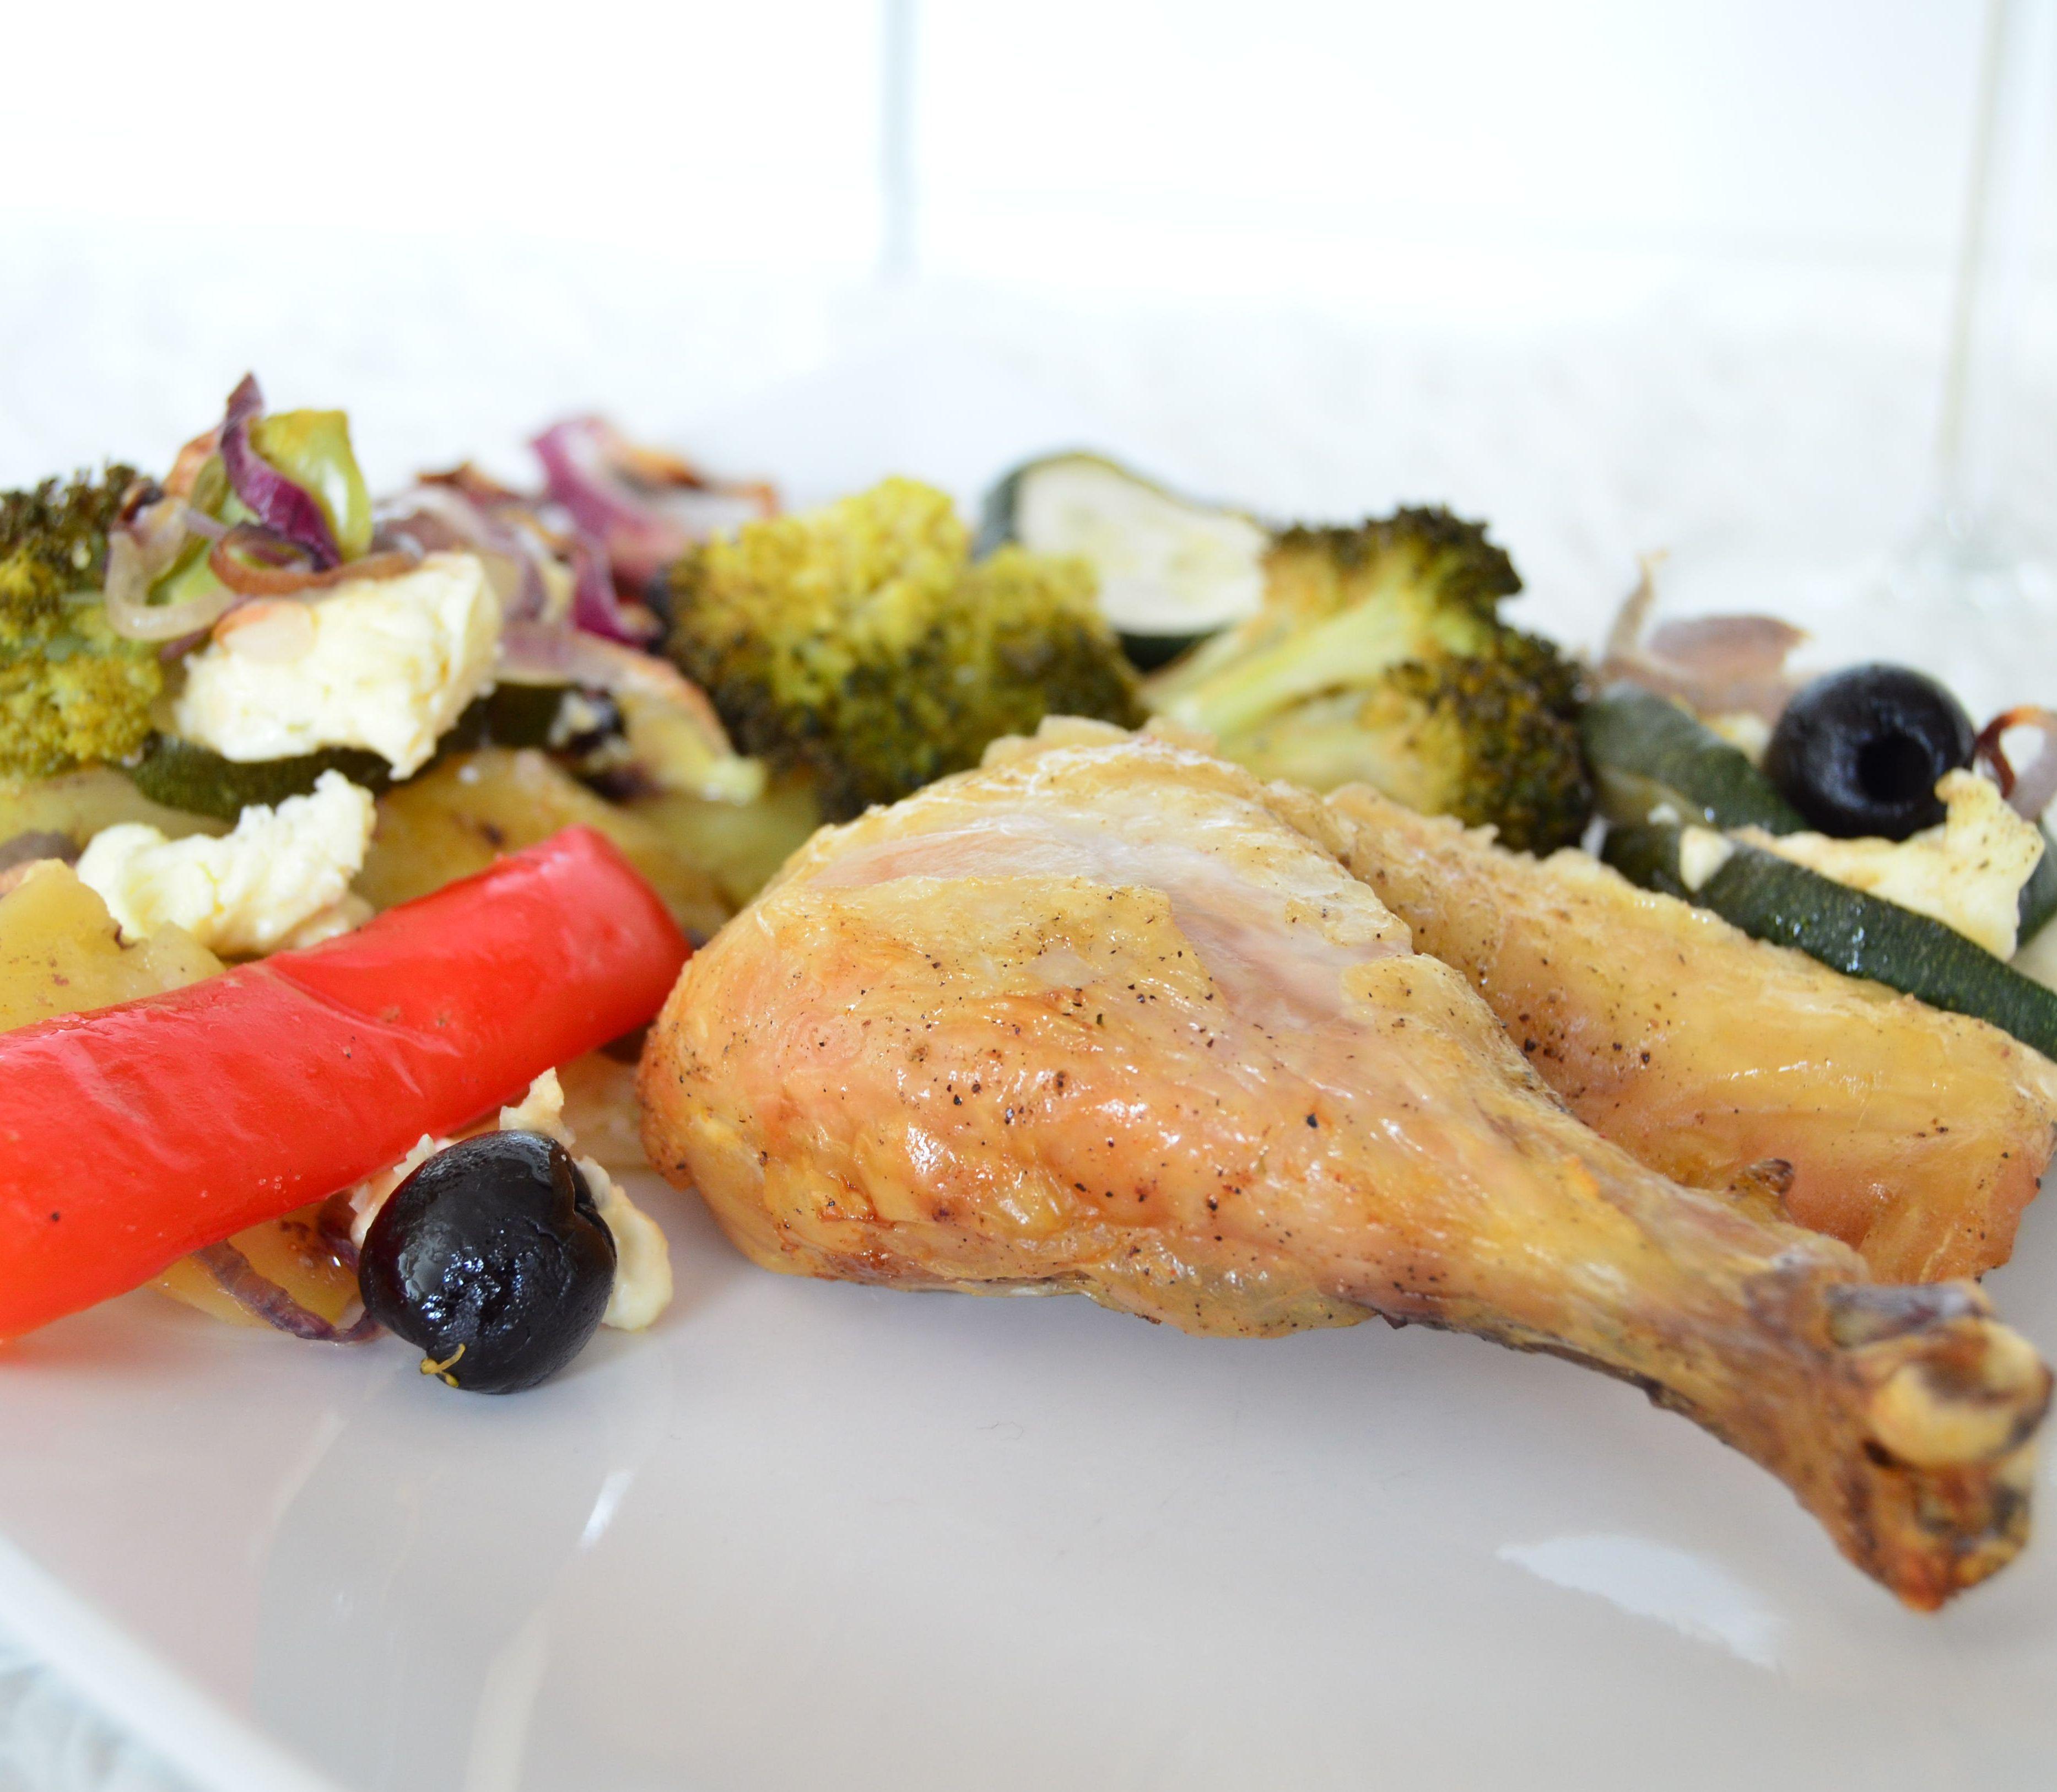 FOTORECEPT Kura po grécky so zeleninou a syrom: Parádny nedeľný obed bez námahy